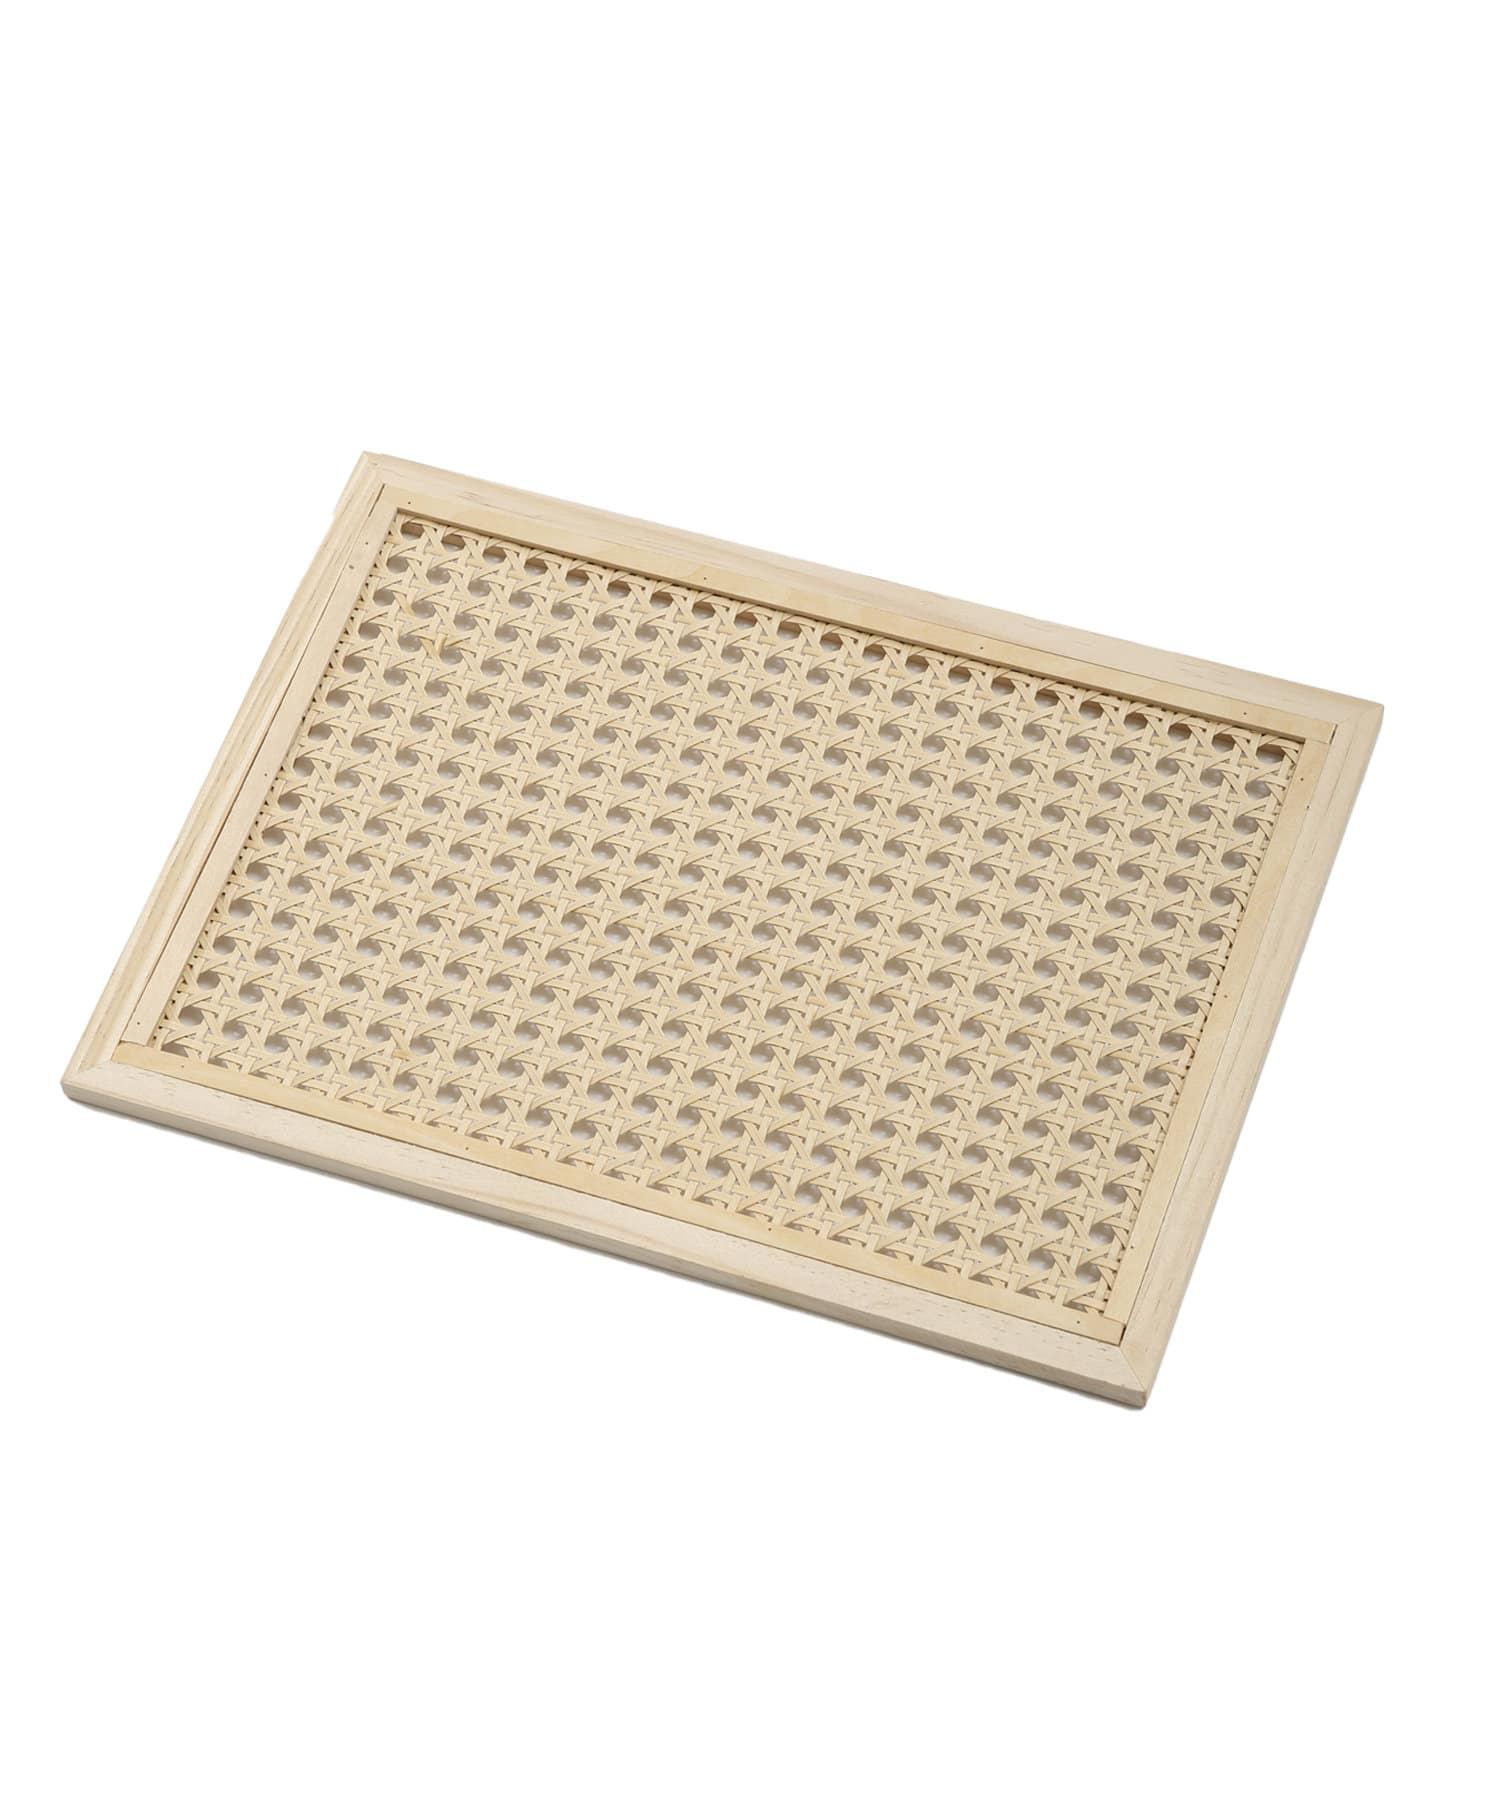 3COINS(スリーコインズ) 【HOME CAFE】カゴメ編みトレー:スクエア